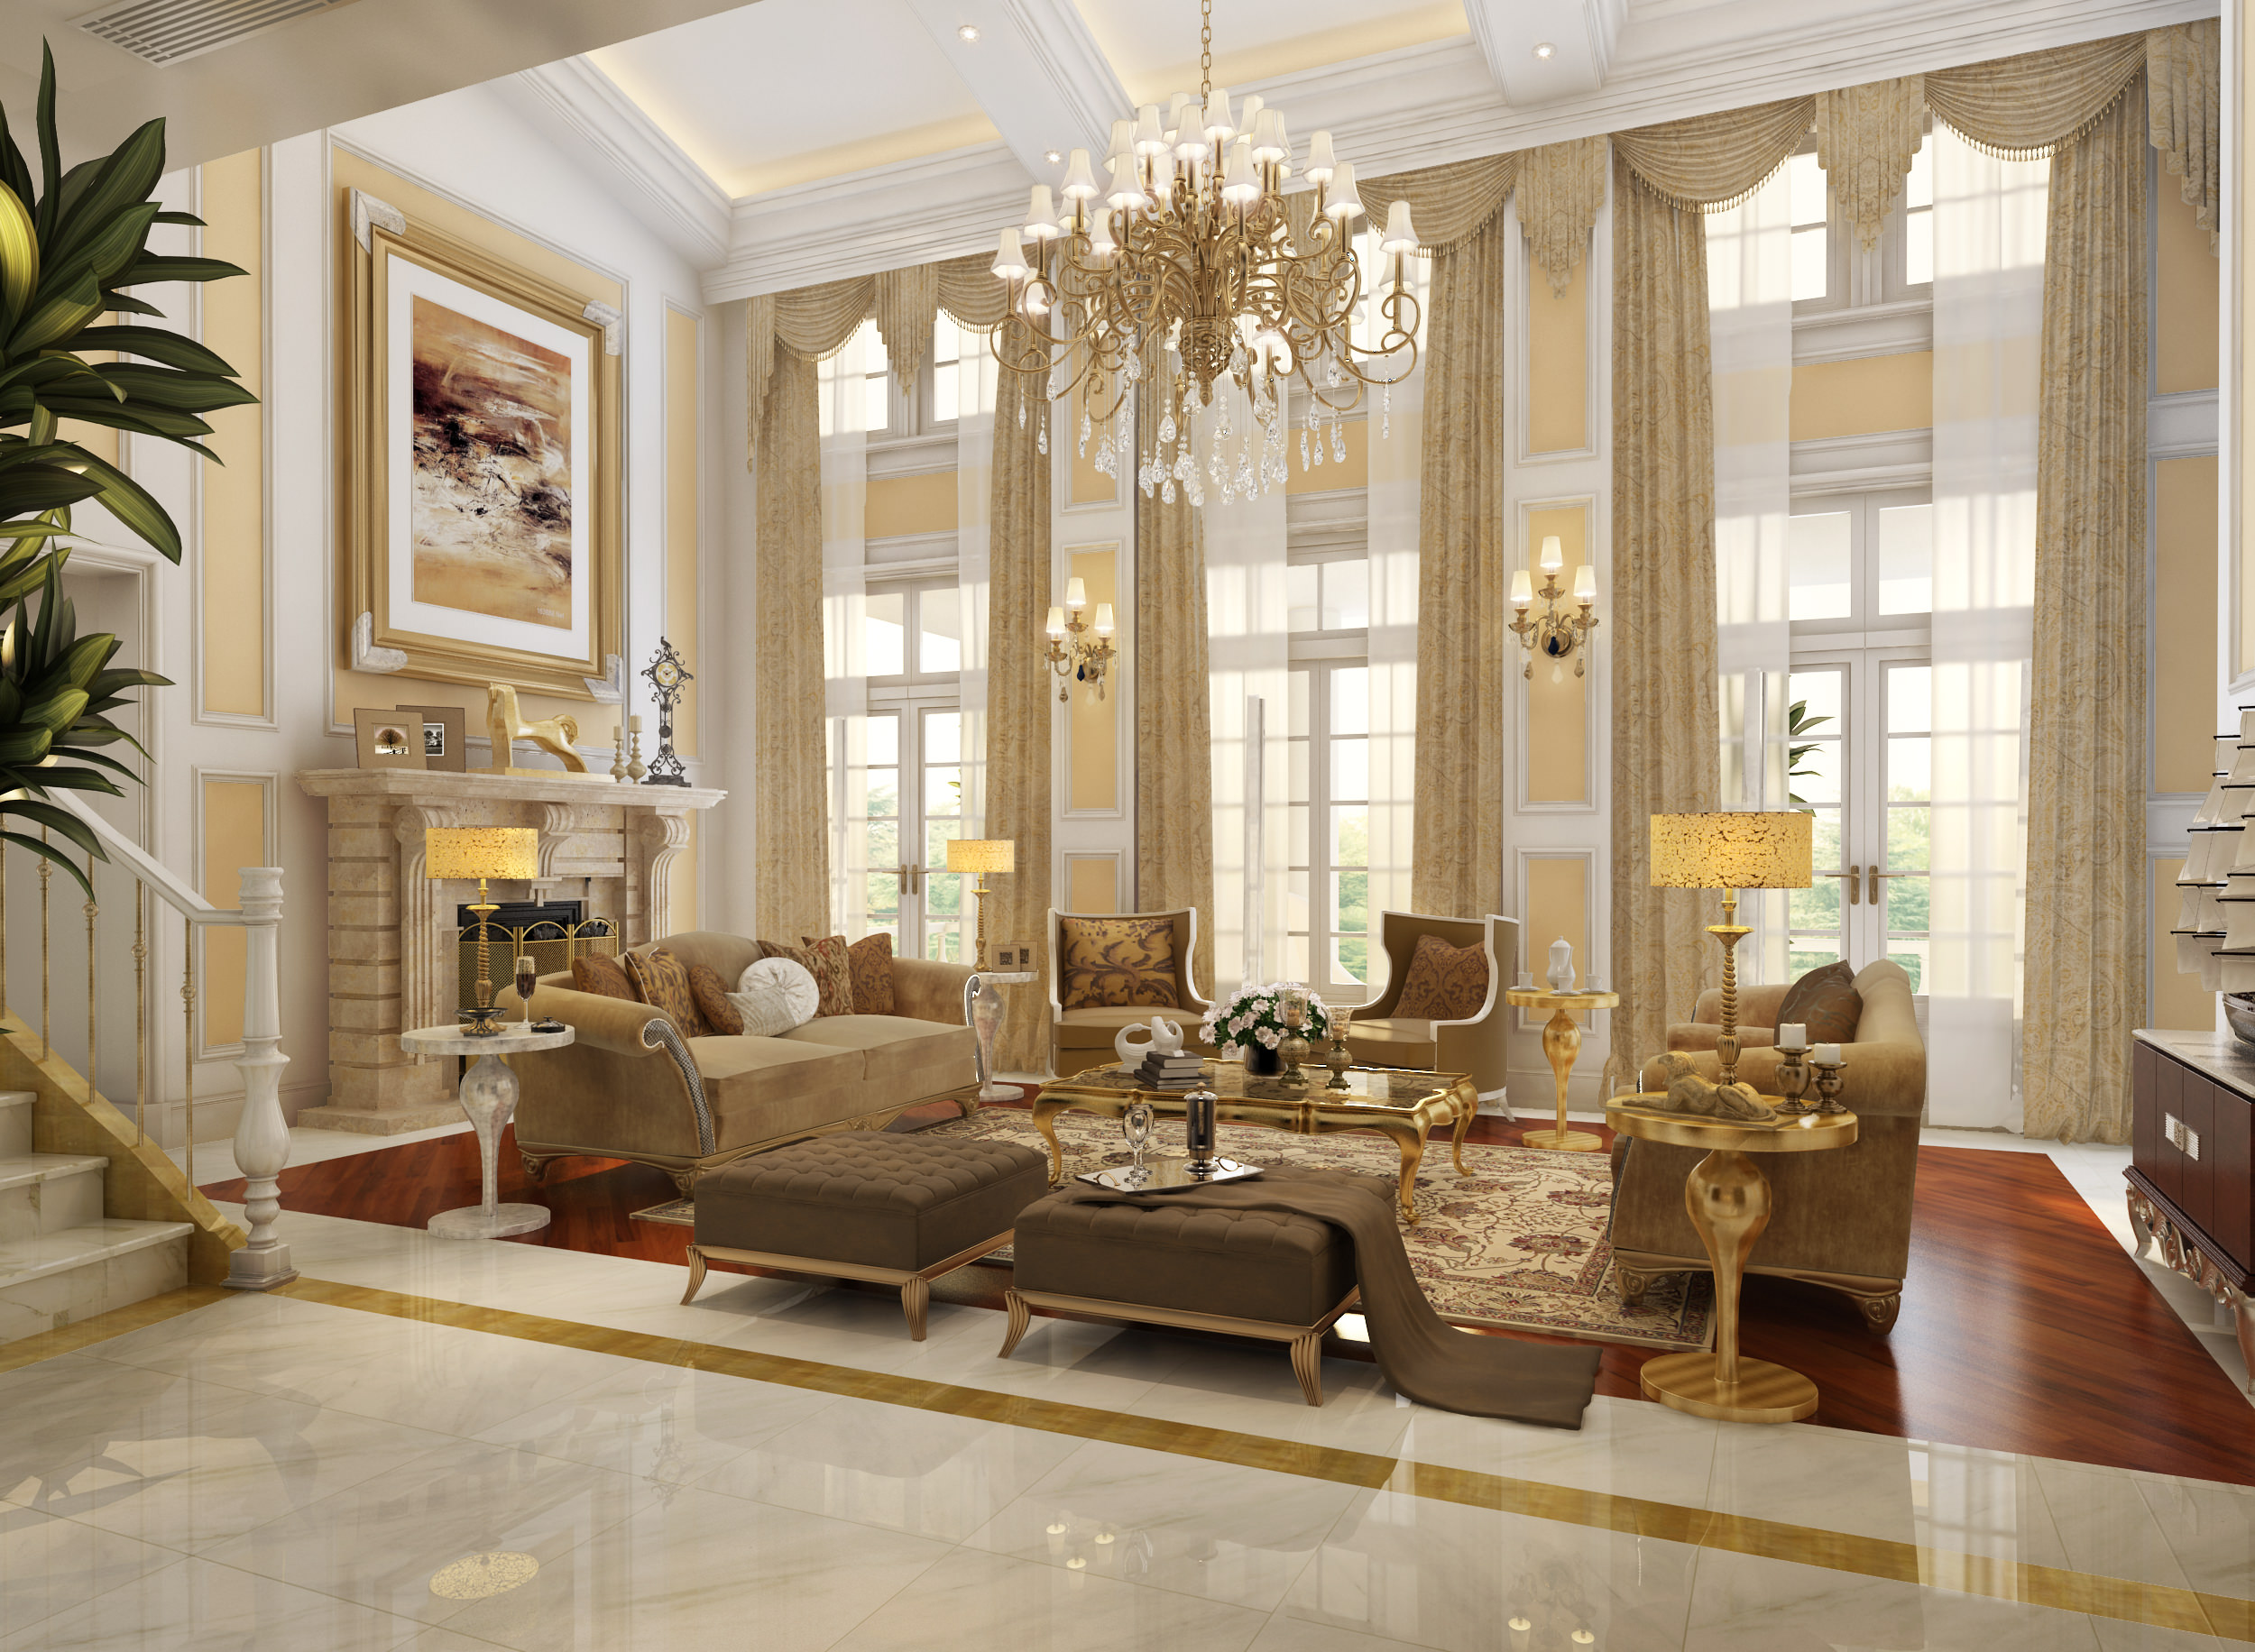 https://img1.cgtrader.com/items/23127/3c818adb6c/huge-luxury-living-room-3d-model-max.jpg